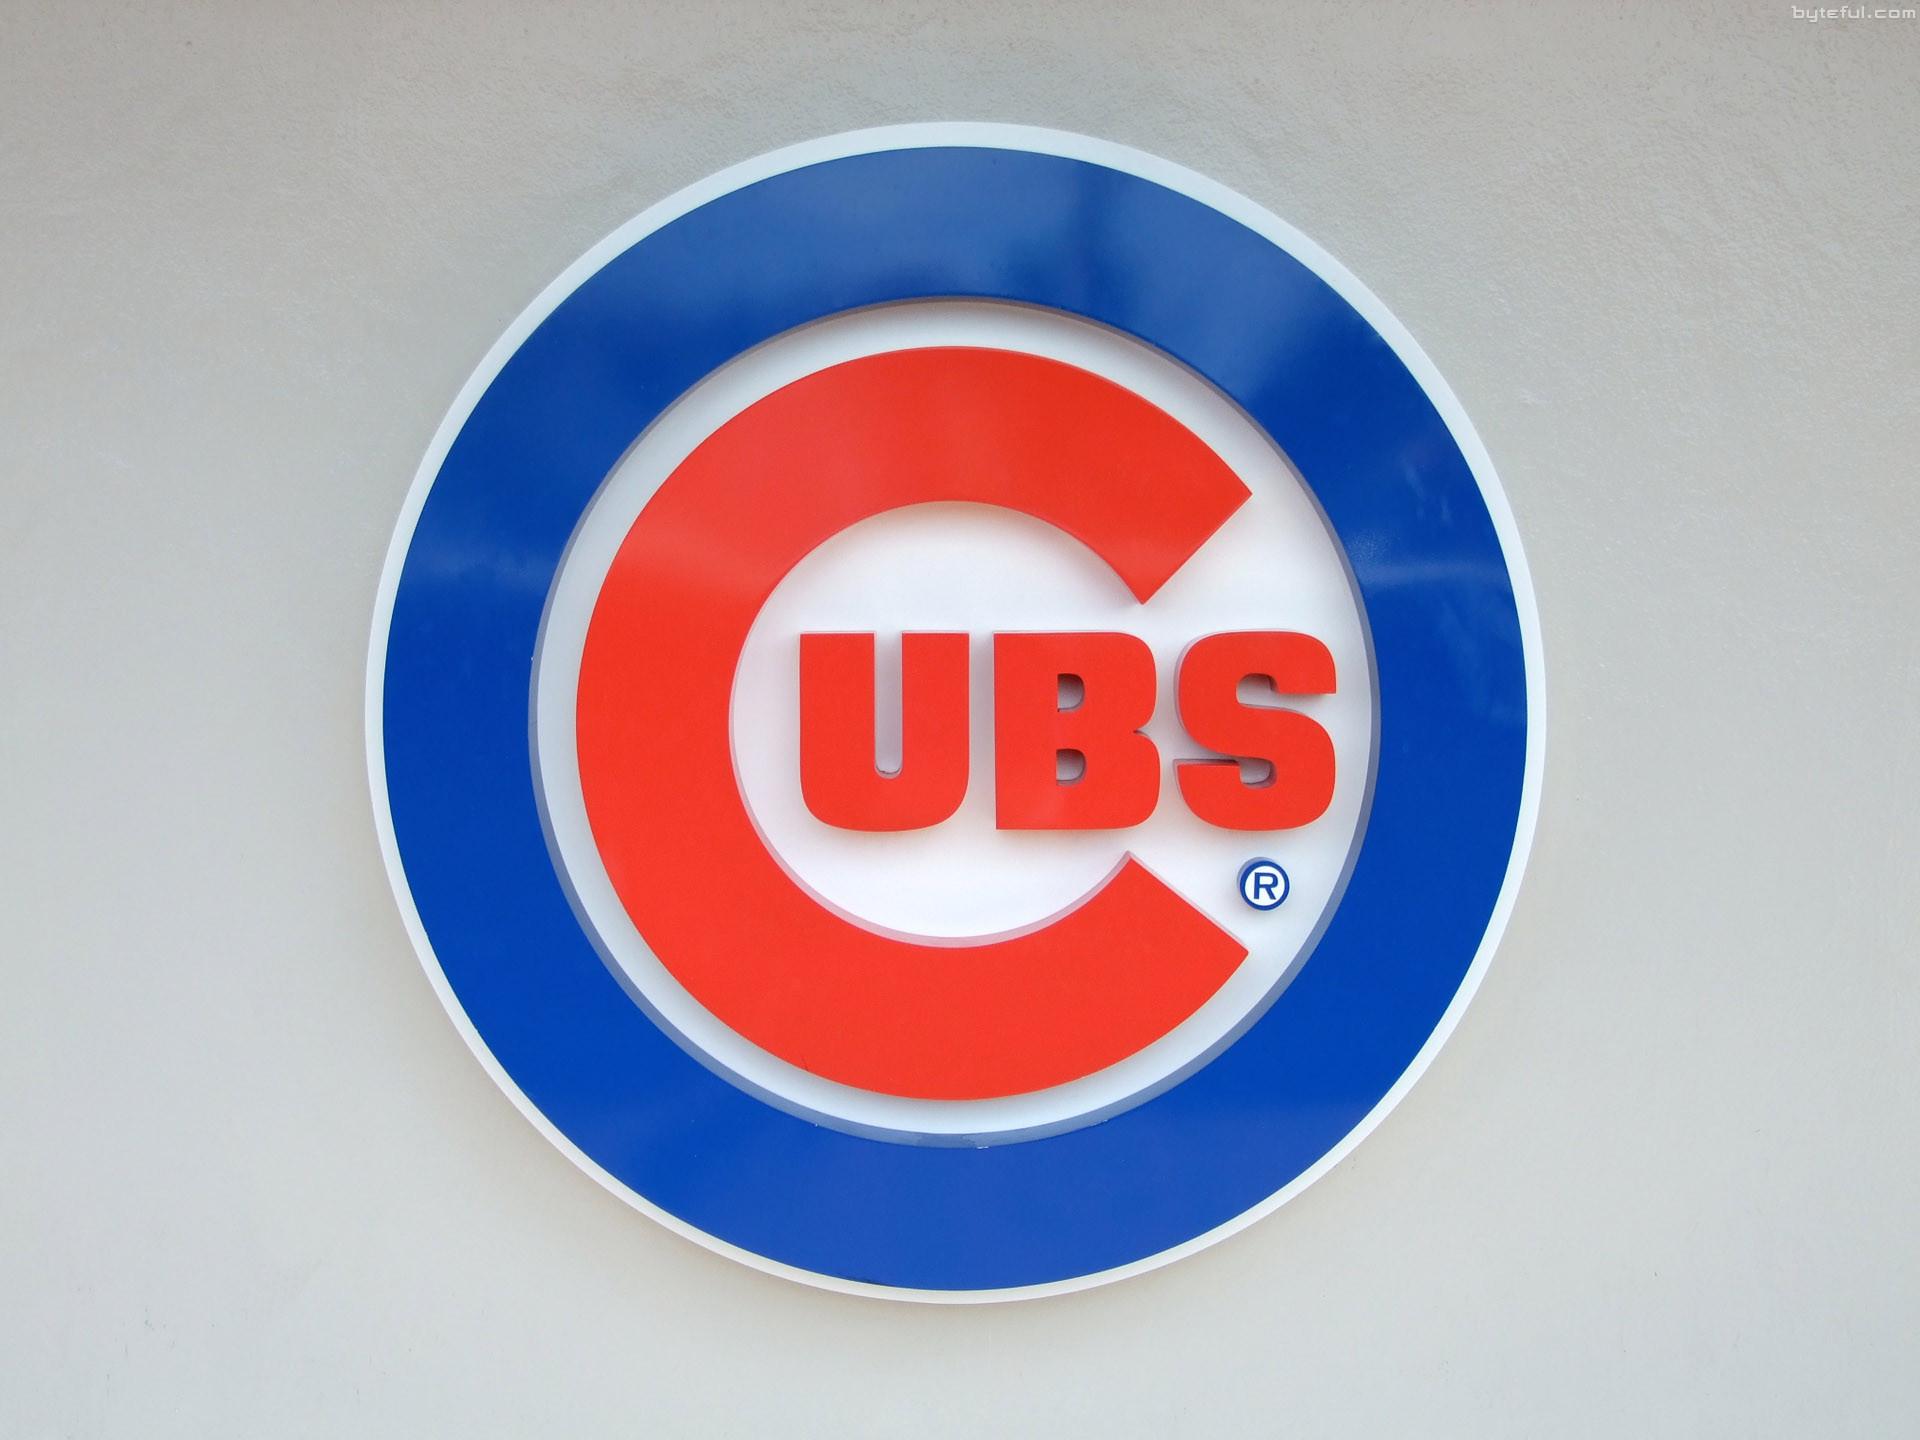 CHICAGO CUBS mlb baseball 33 wallpaper 1920x1440 232543 1920x1440